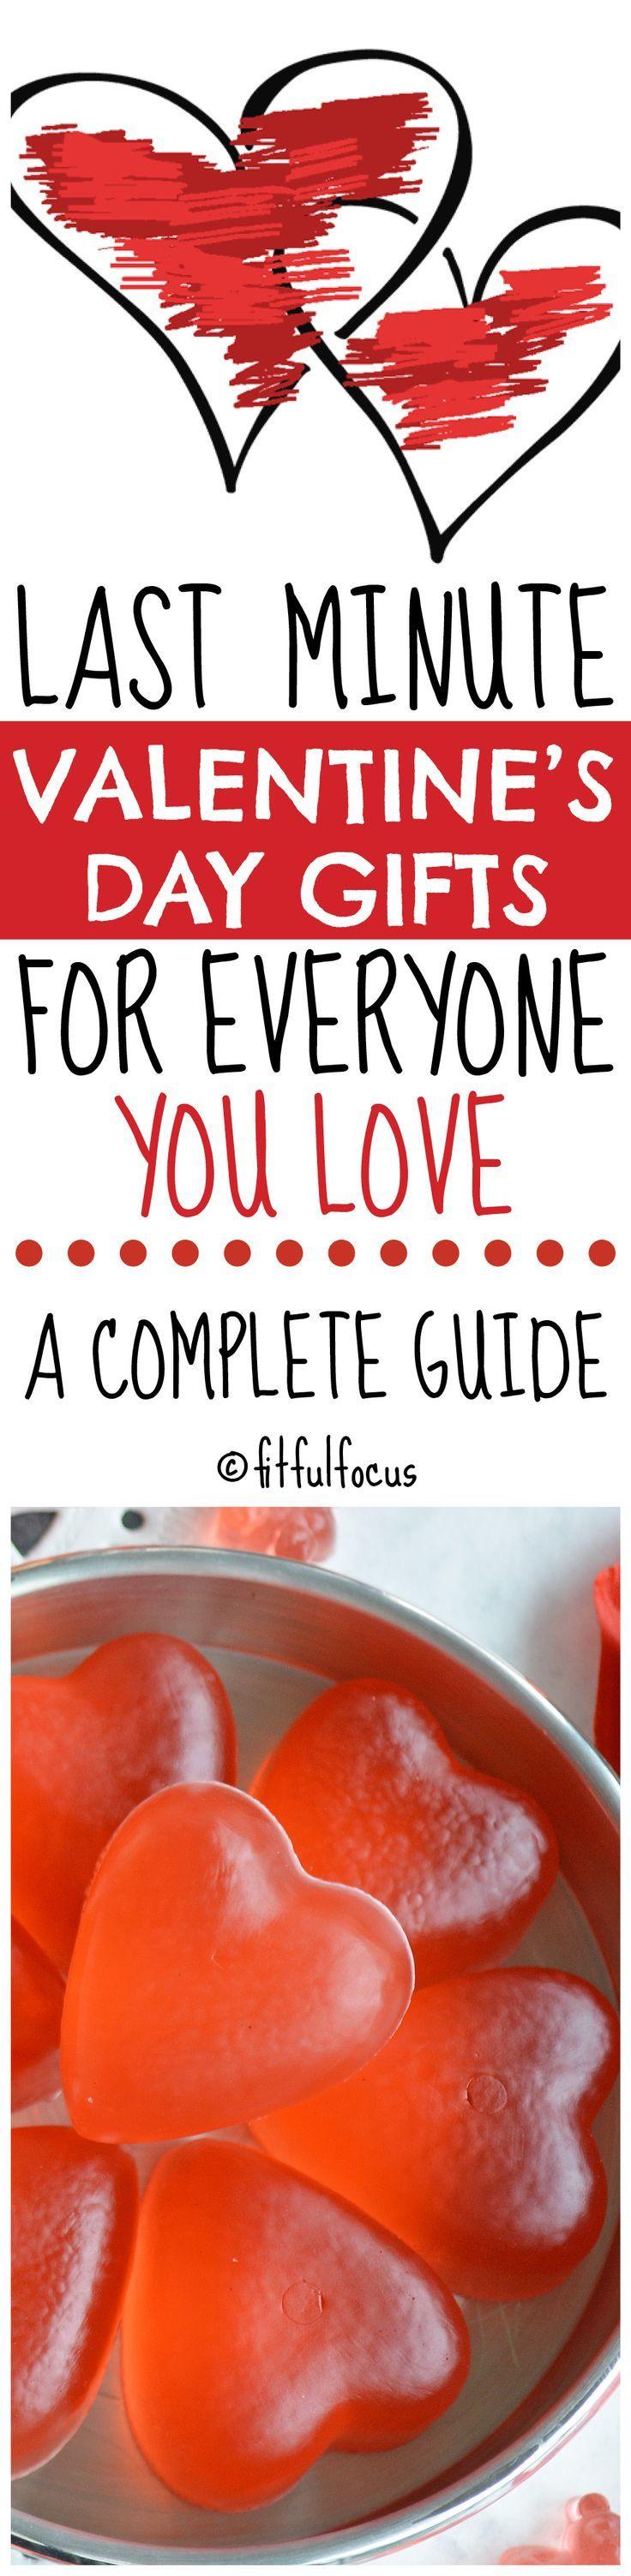 Last Minute Valentine's Day Gifts | Valentine's Day | DIY Valentine's Day Gifts | Fit & Fashionable Friday | Valentines Day Recipes http://fitfulfocus.com/last-minute-valentines-day-gifts-for-everyone-you-love/?utm_campaign=coschedule&utm_source=pinterest&utm_medium=Fitful%20Focus&utm_content=Last%20Minute%20Valentine%27s%20Day%20Gifts%20For%20Everyone%20You%20Love